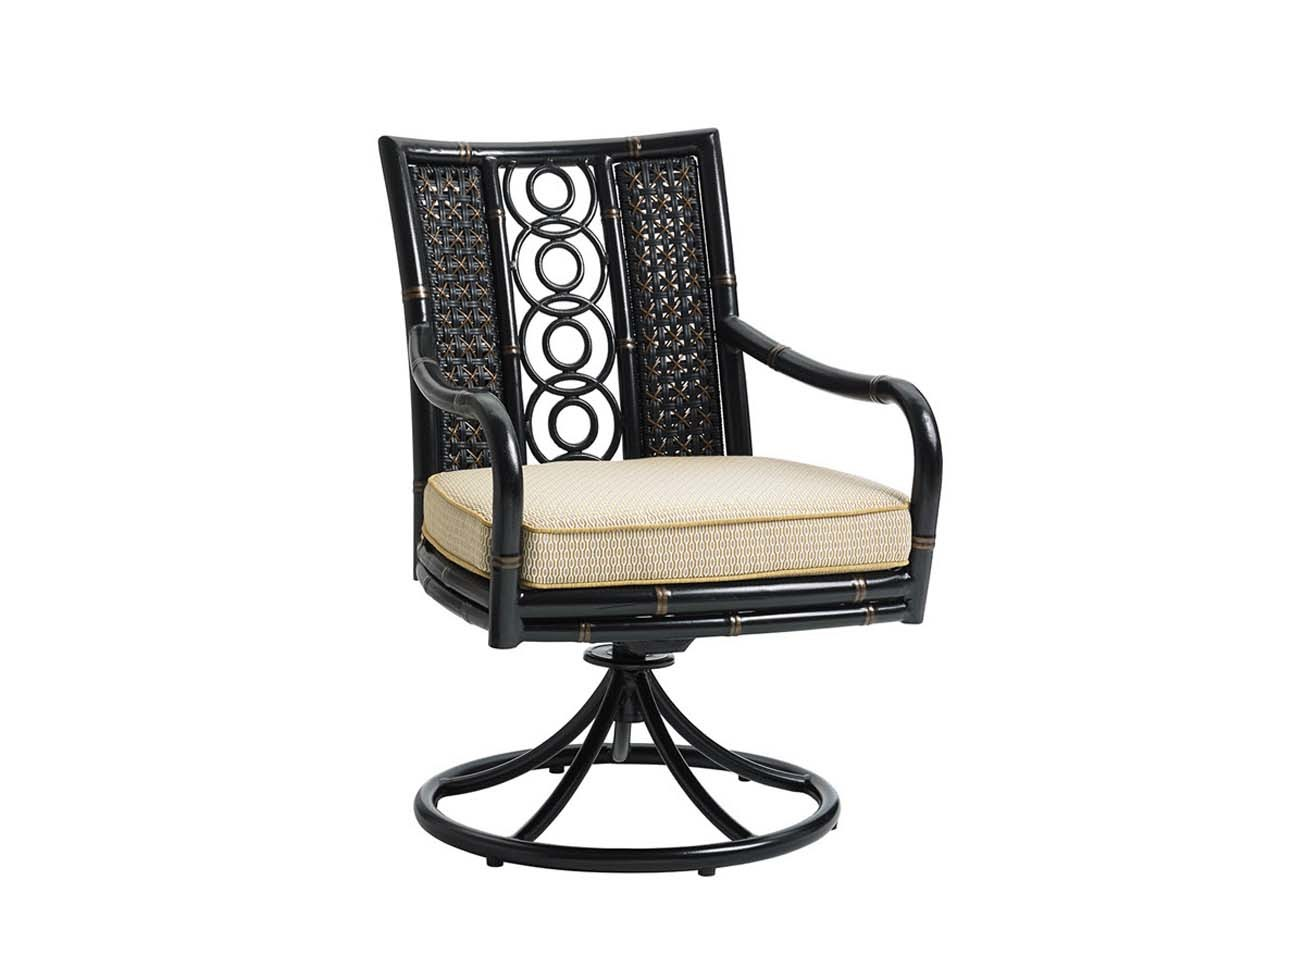 Marimba Swivel Rocker Lounge Chair Hauser S Patio